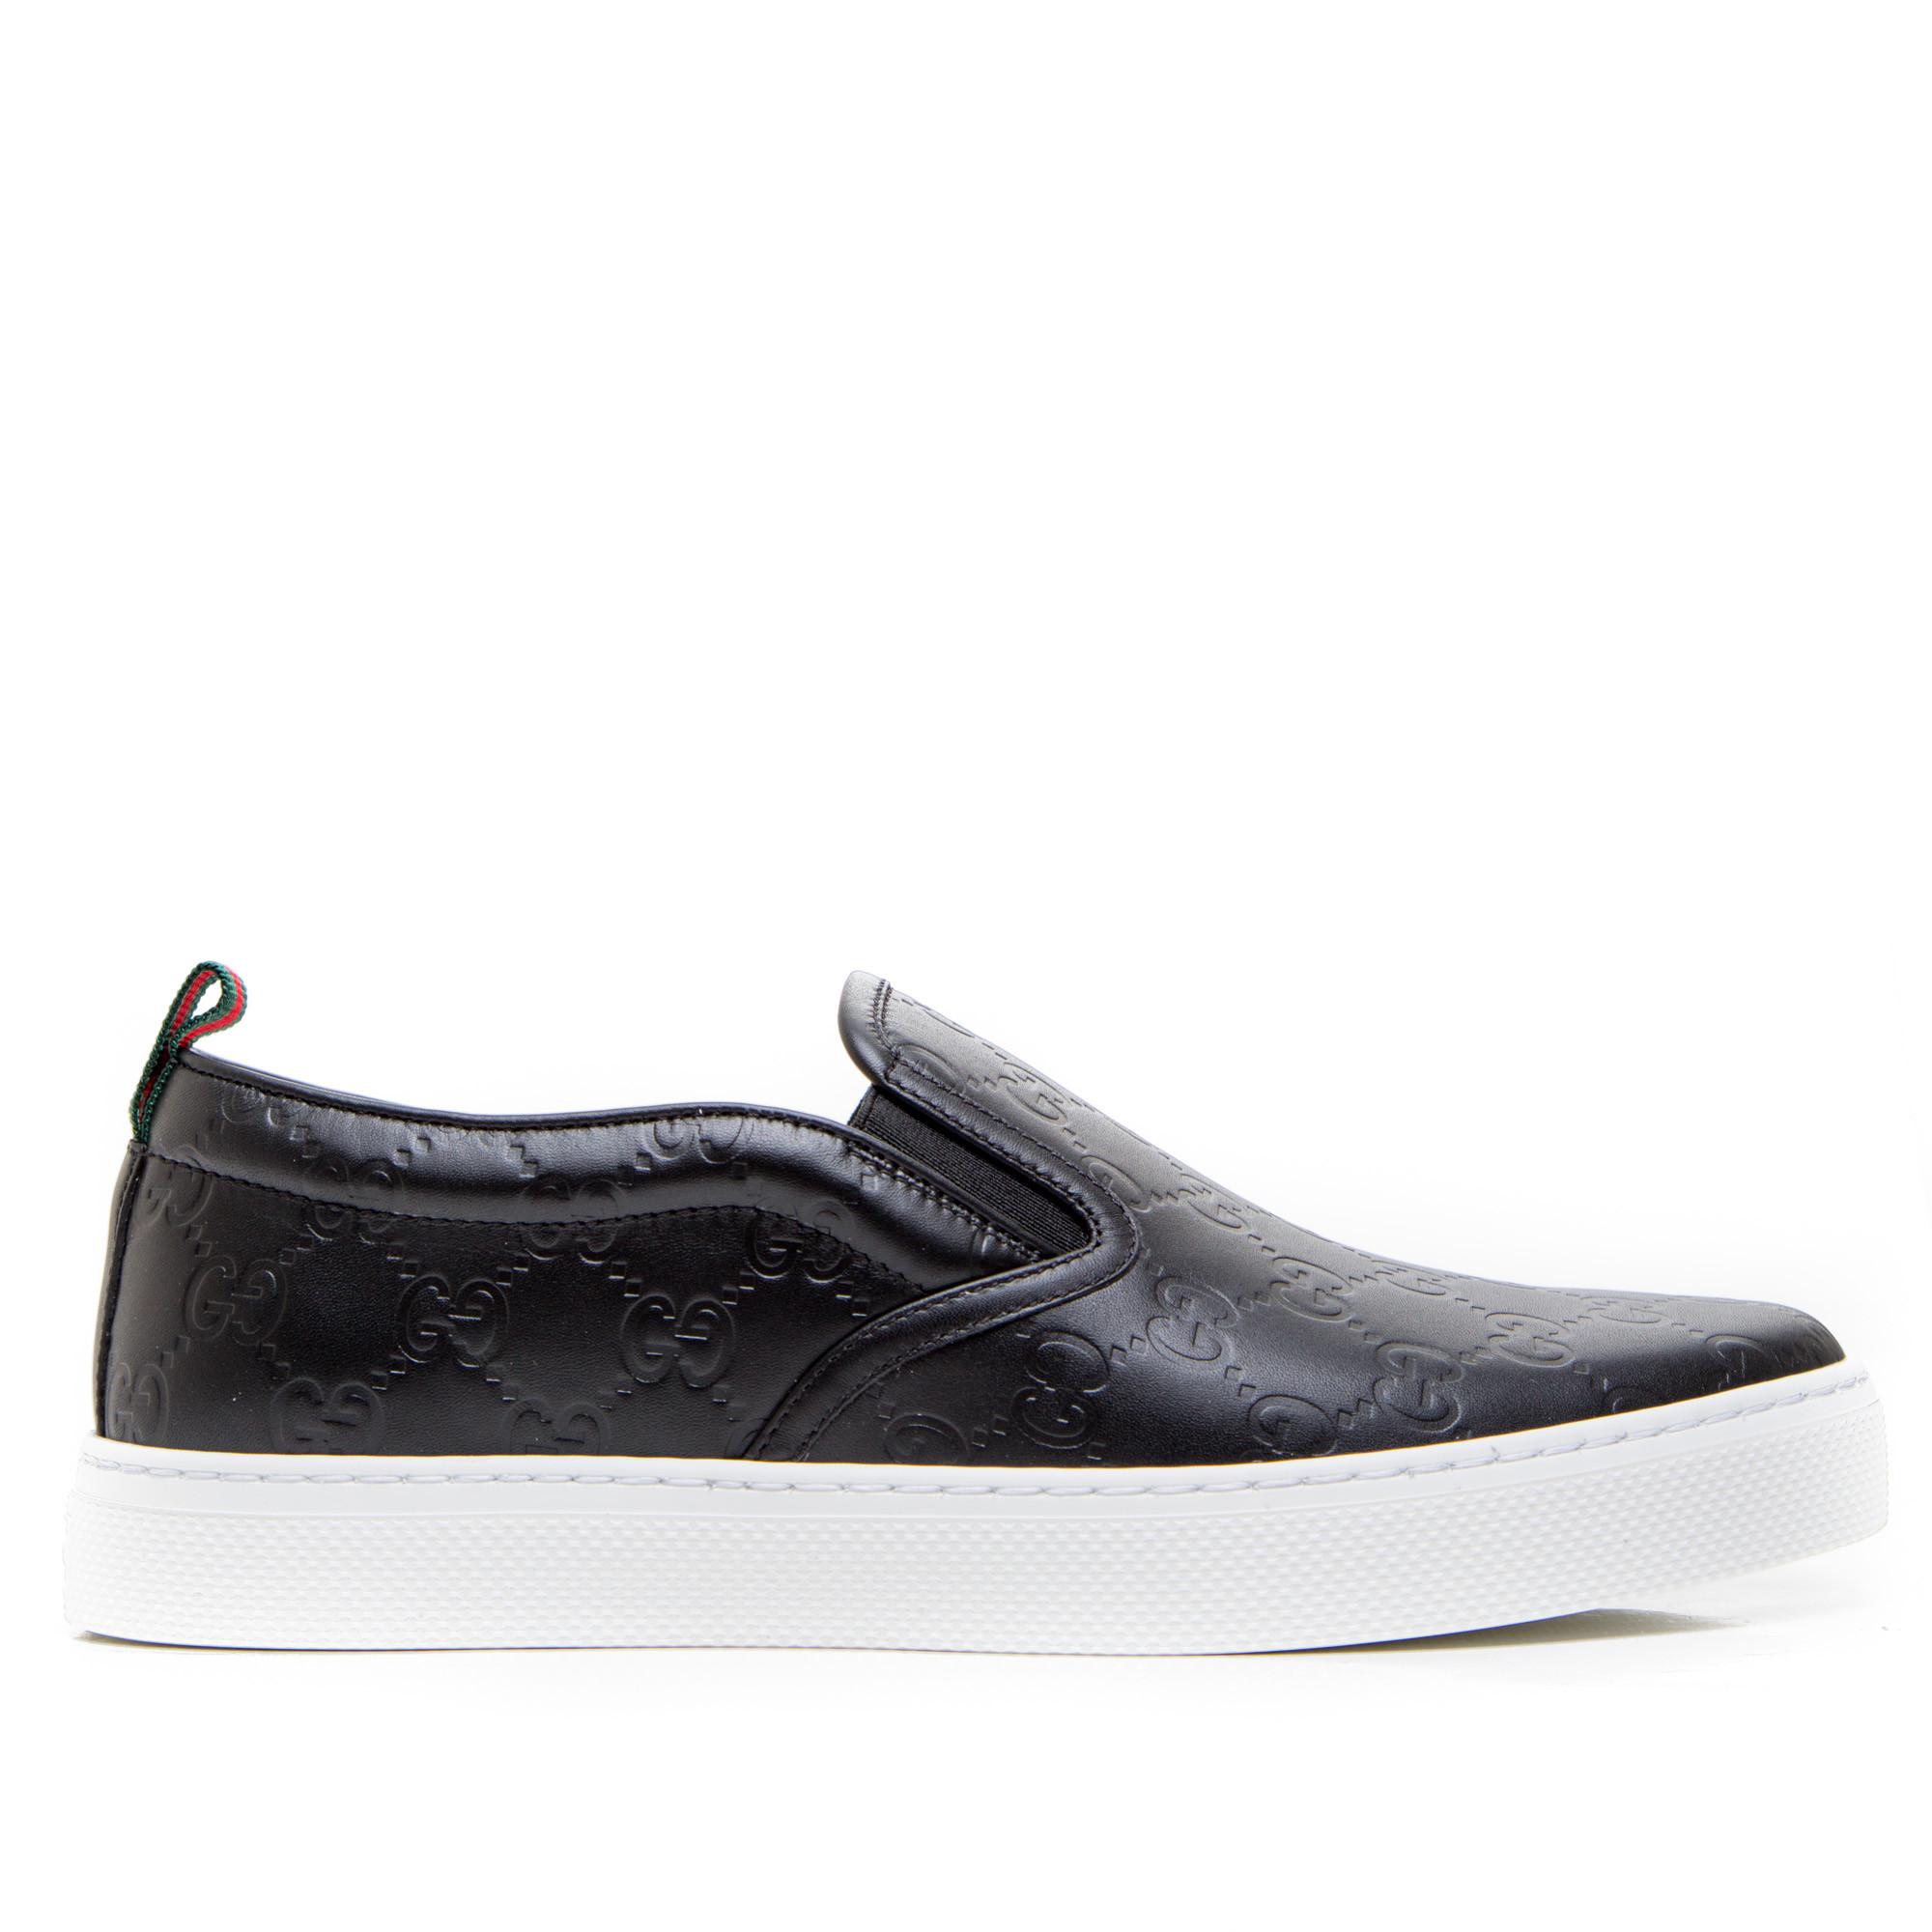 8eb3562fc58f Gucci sport shoes black407364   cwce0   1174 ss19